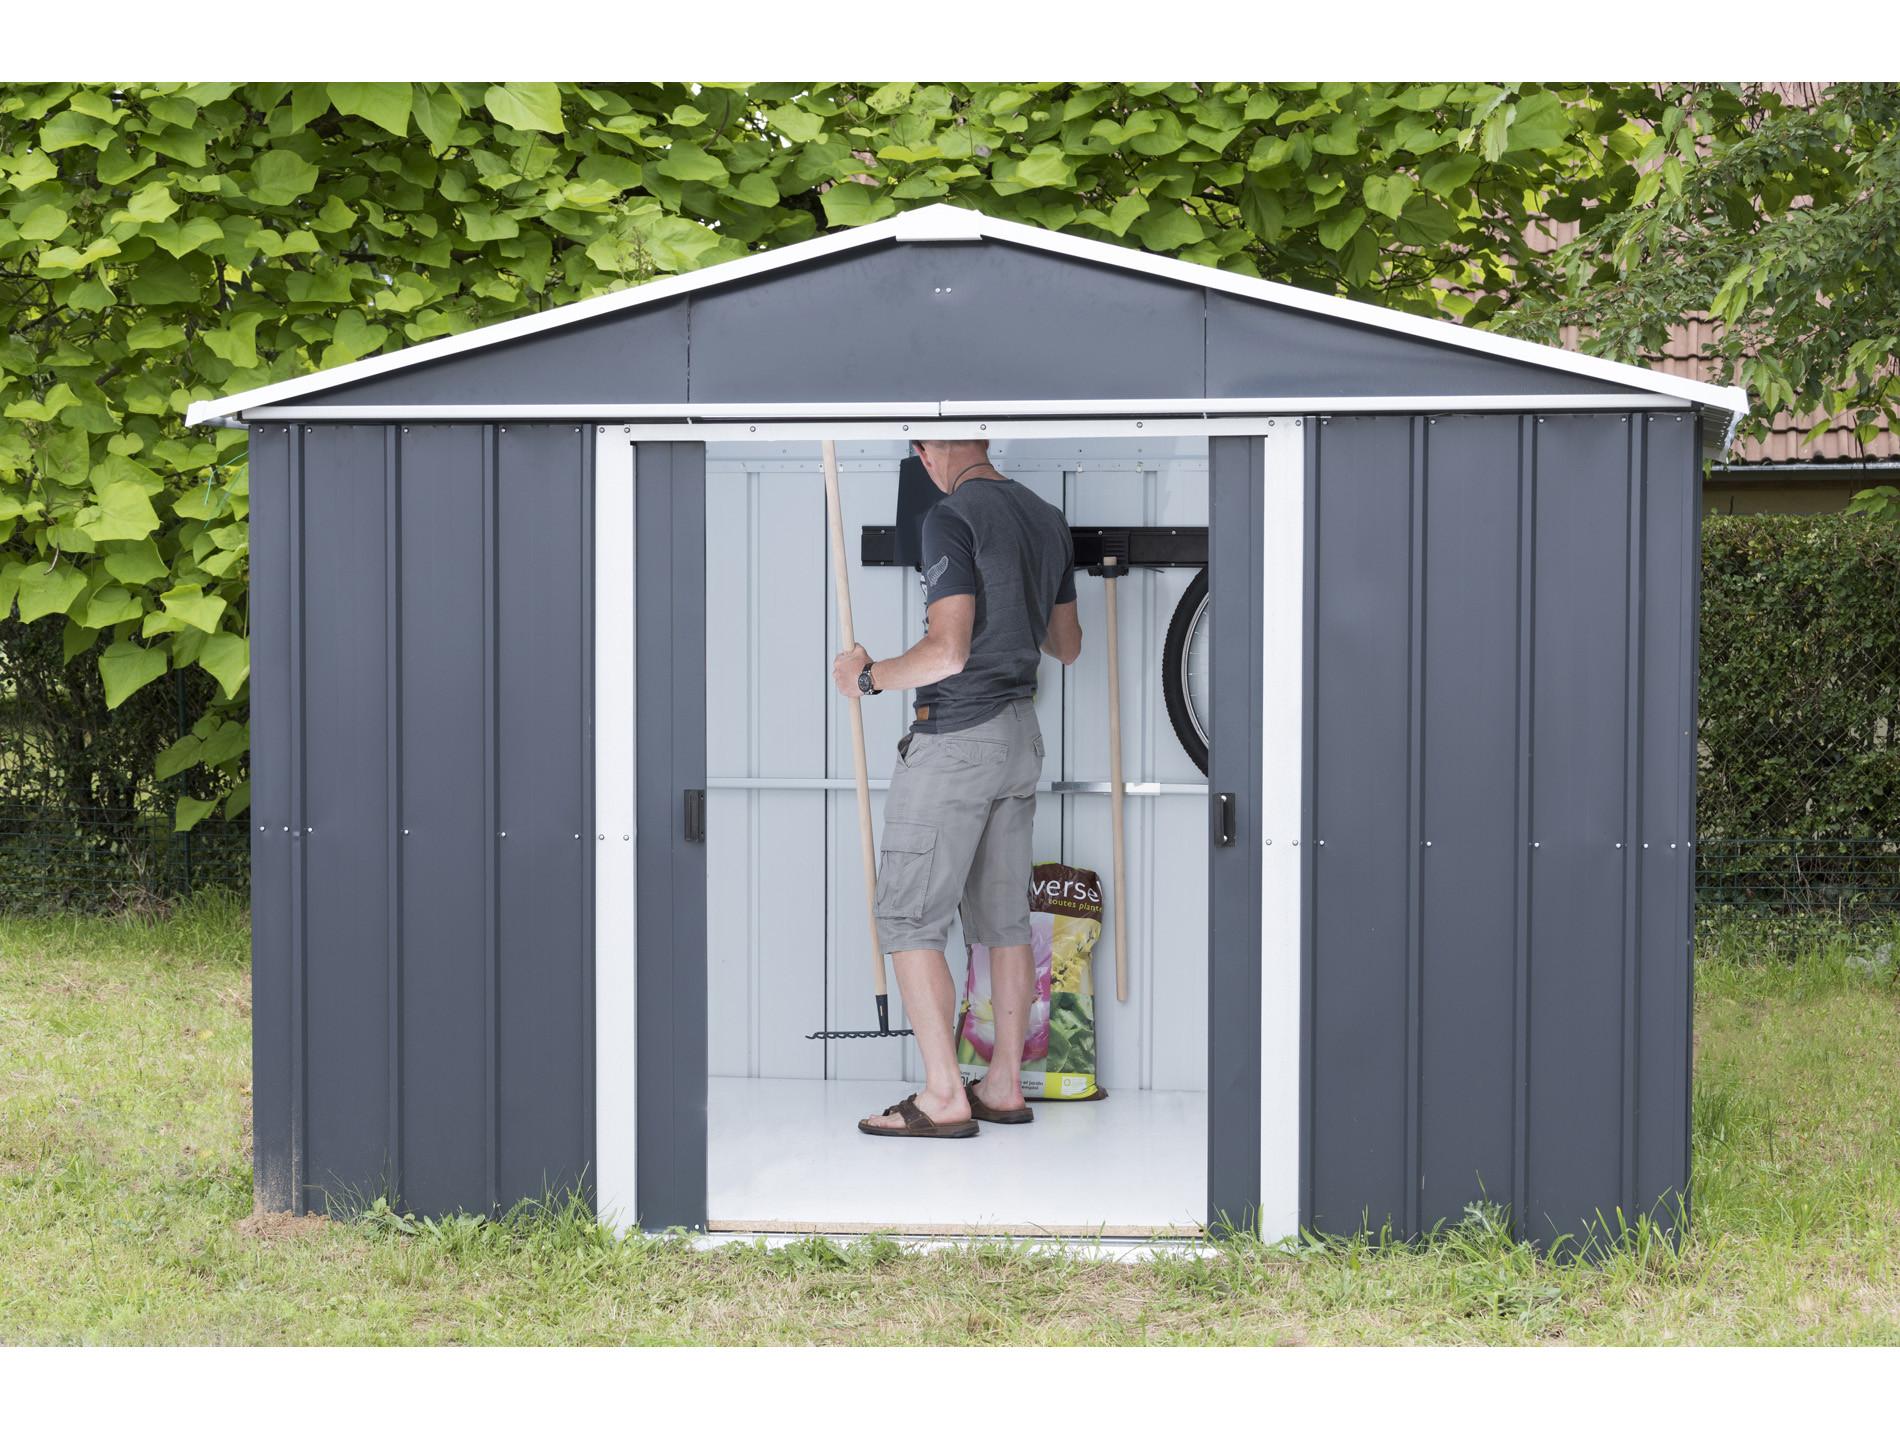 Abri de jardin métal Yardmaster gris anthracite 7,18 m² - Abris de ...